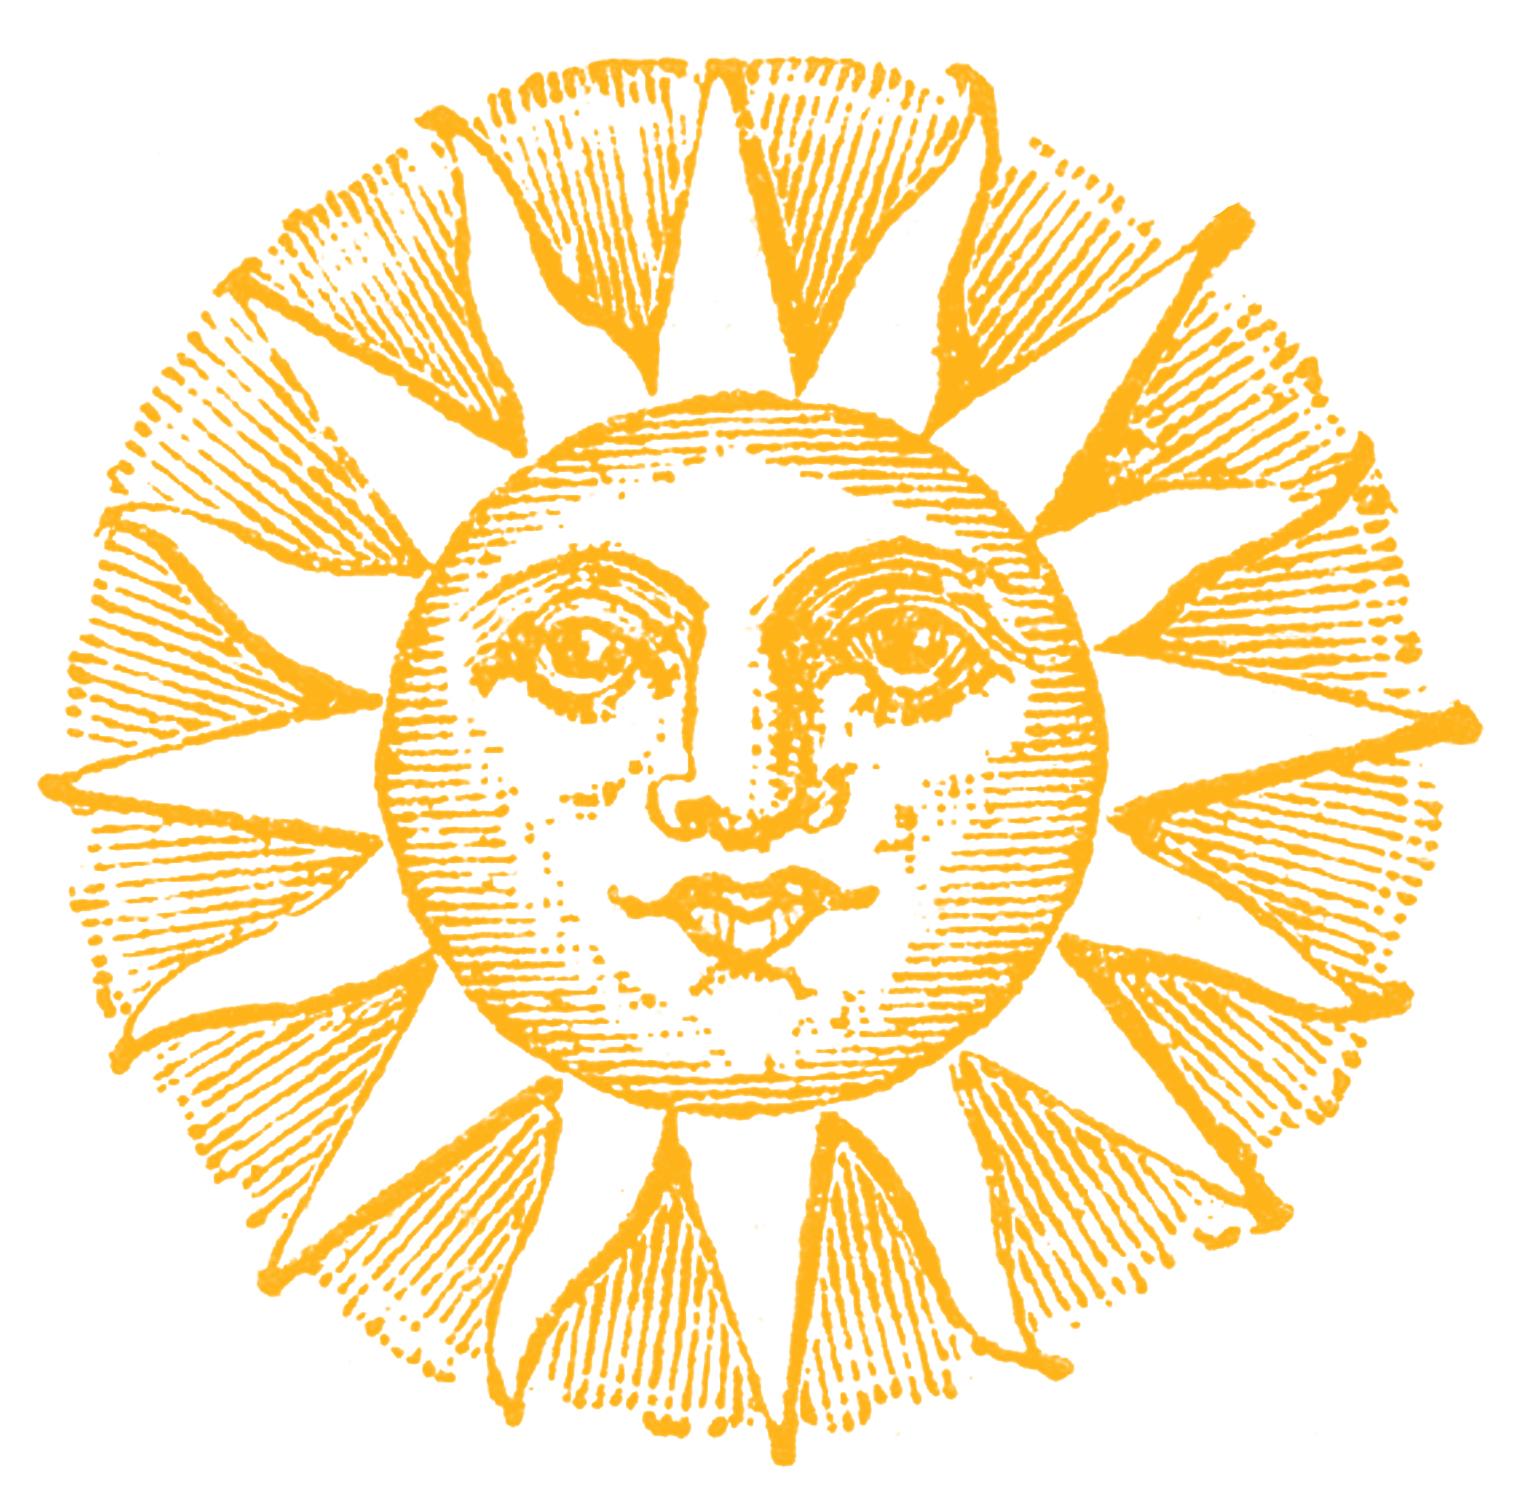 Triipy clipart celestial The Sun Fashioned Sun Old